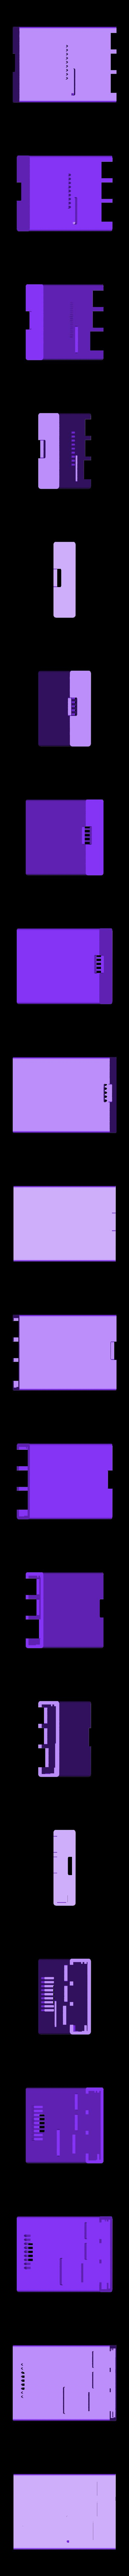 Raspberry_Pi_3B%2B_Sleeve.Sleeve.Body1-HDMI-Headphone-Jack-Camera-Port.stl Télécharger fichier STL gratuit Raspberry Pi 3B+ Sleeve • Design à imprimer en 3D, Wilko